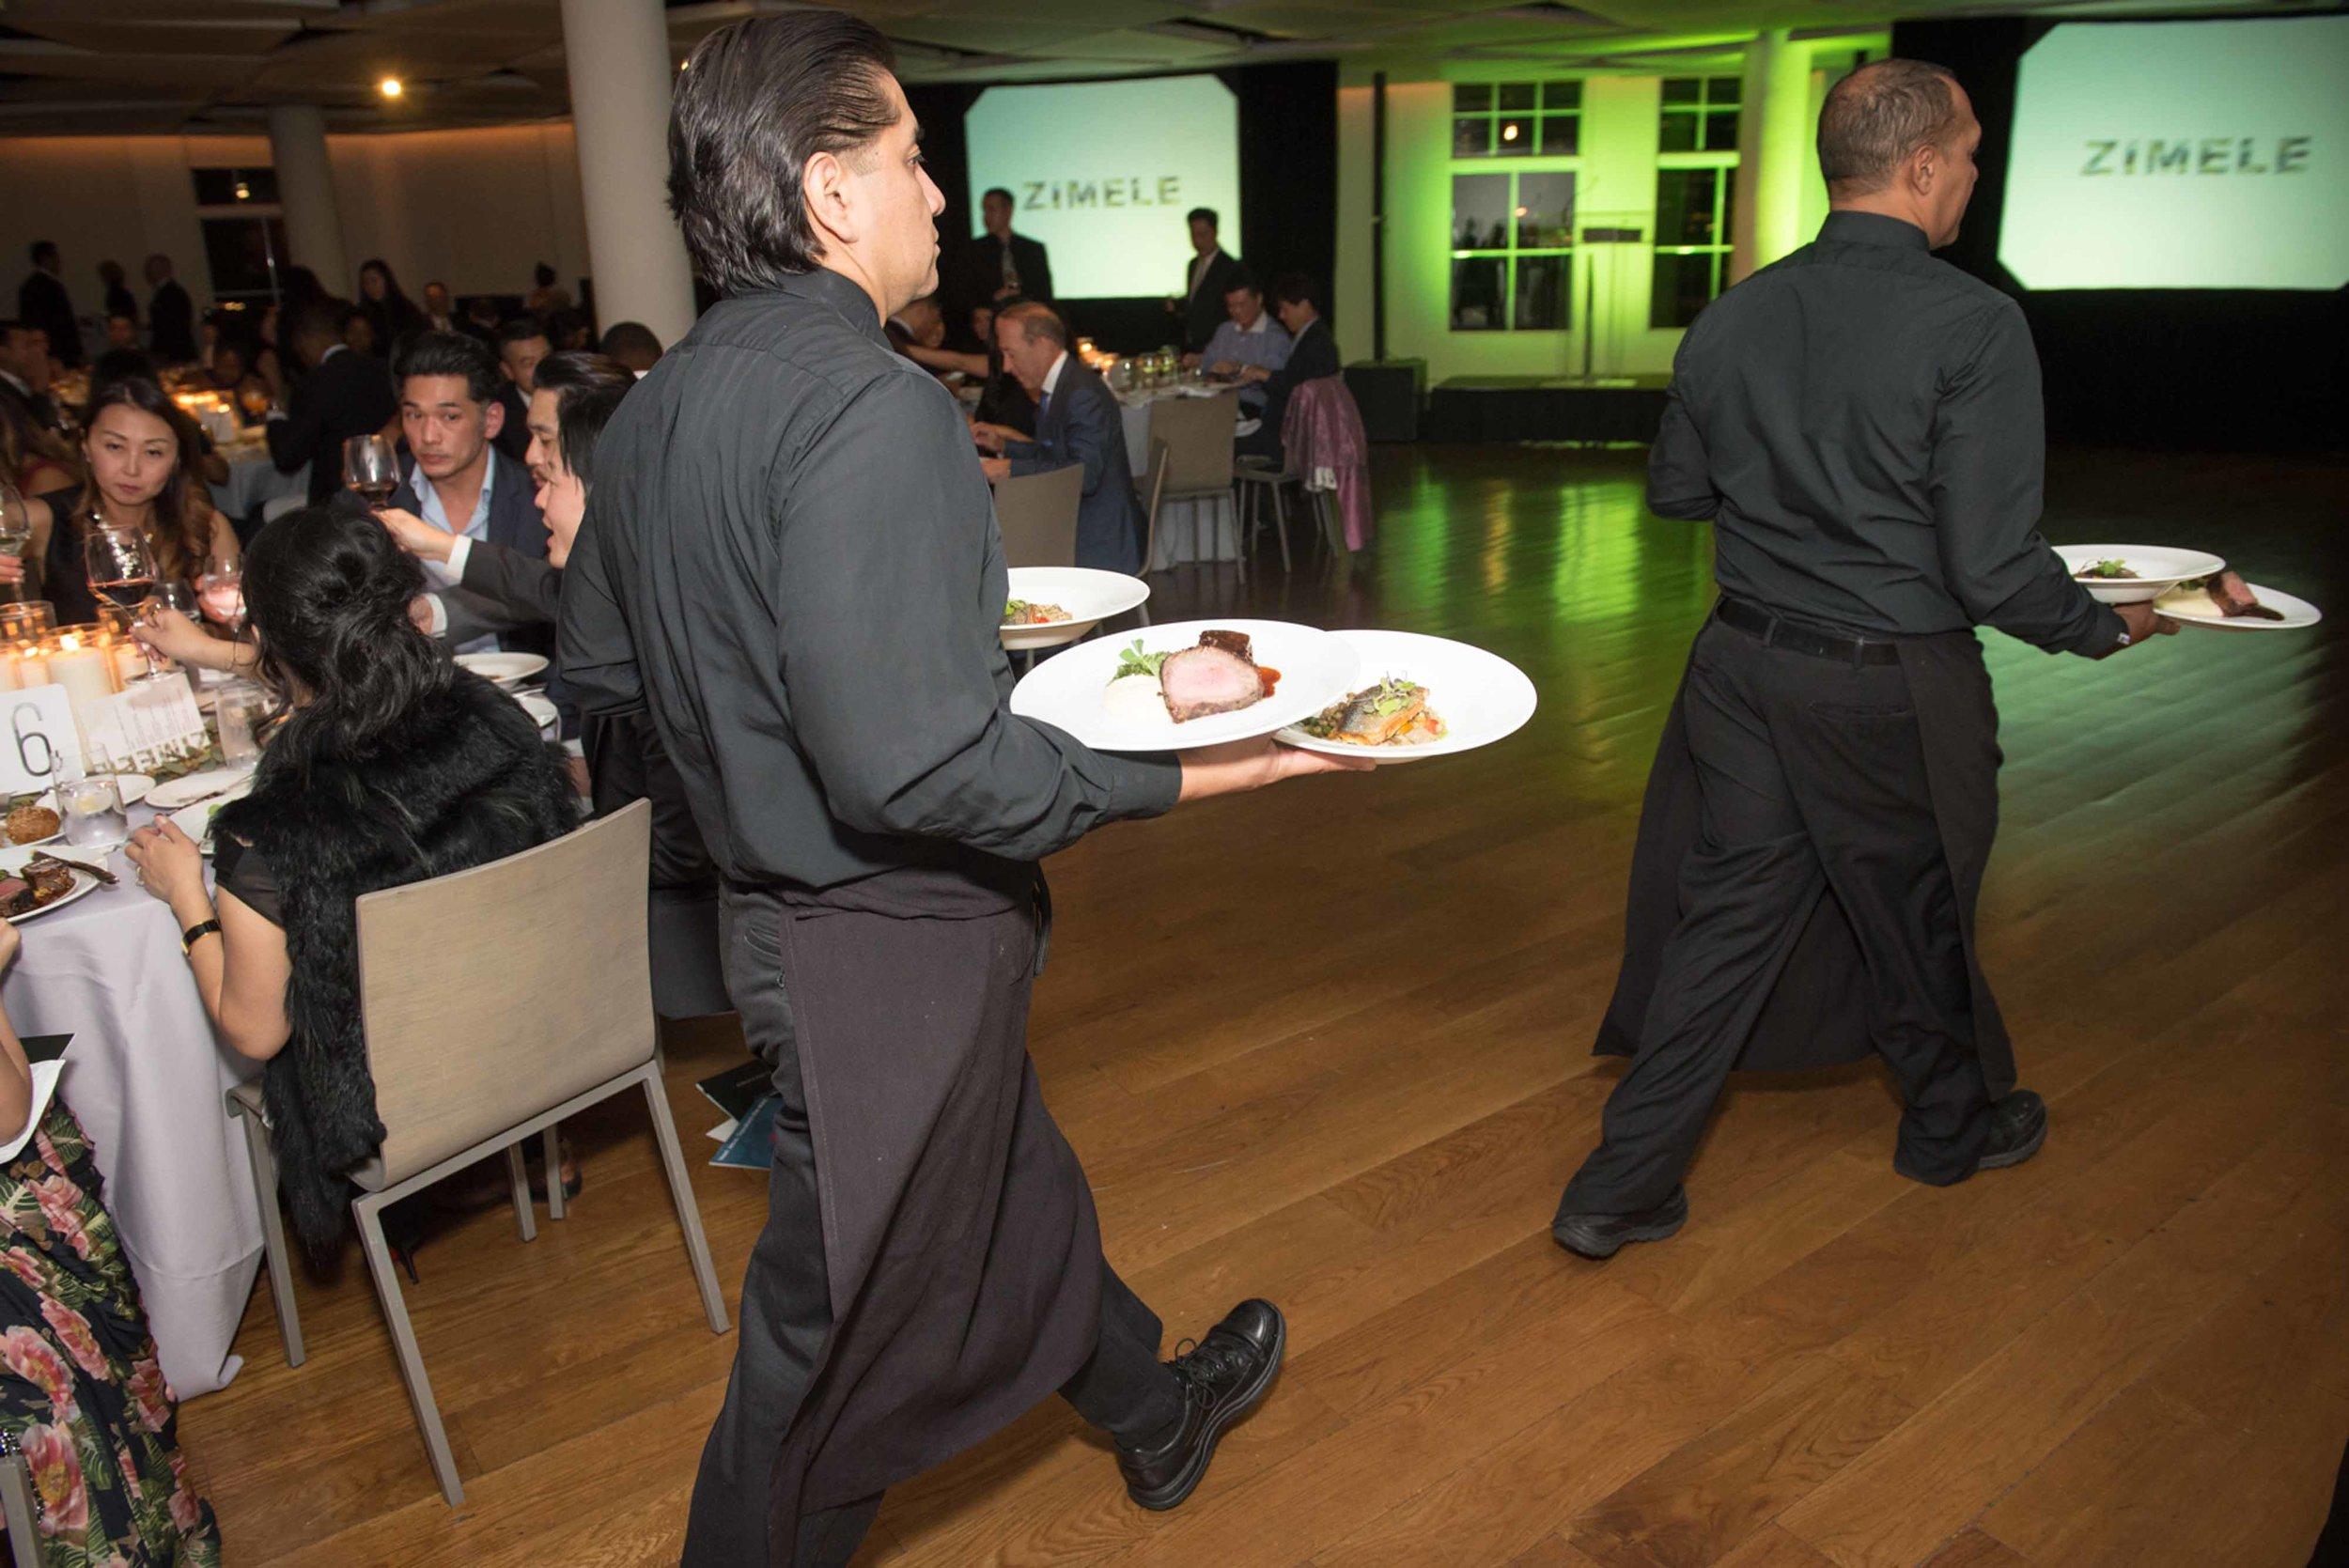 2017-10-21 Zimele USA 6th Annual Gala - Maritime Parc - Jersey City NJ_0175.jpg